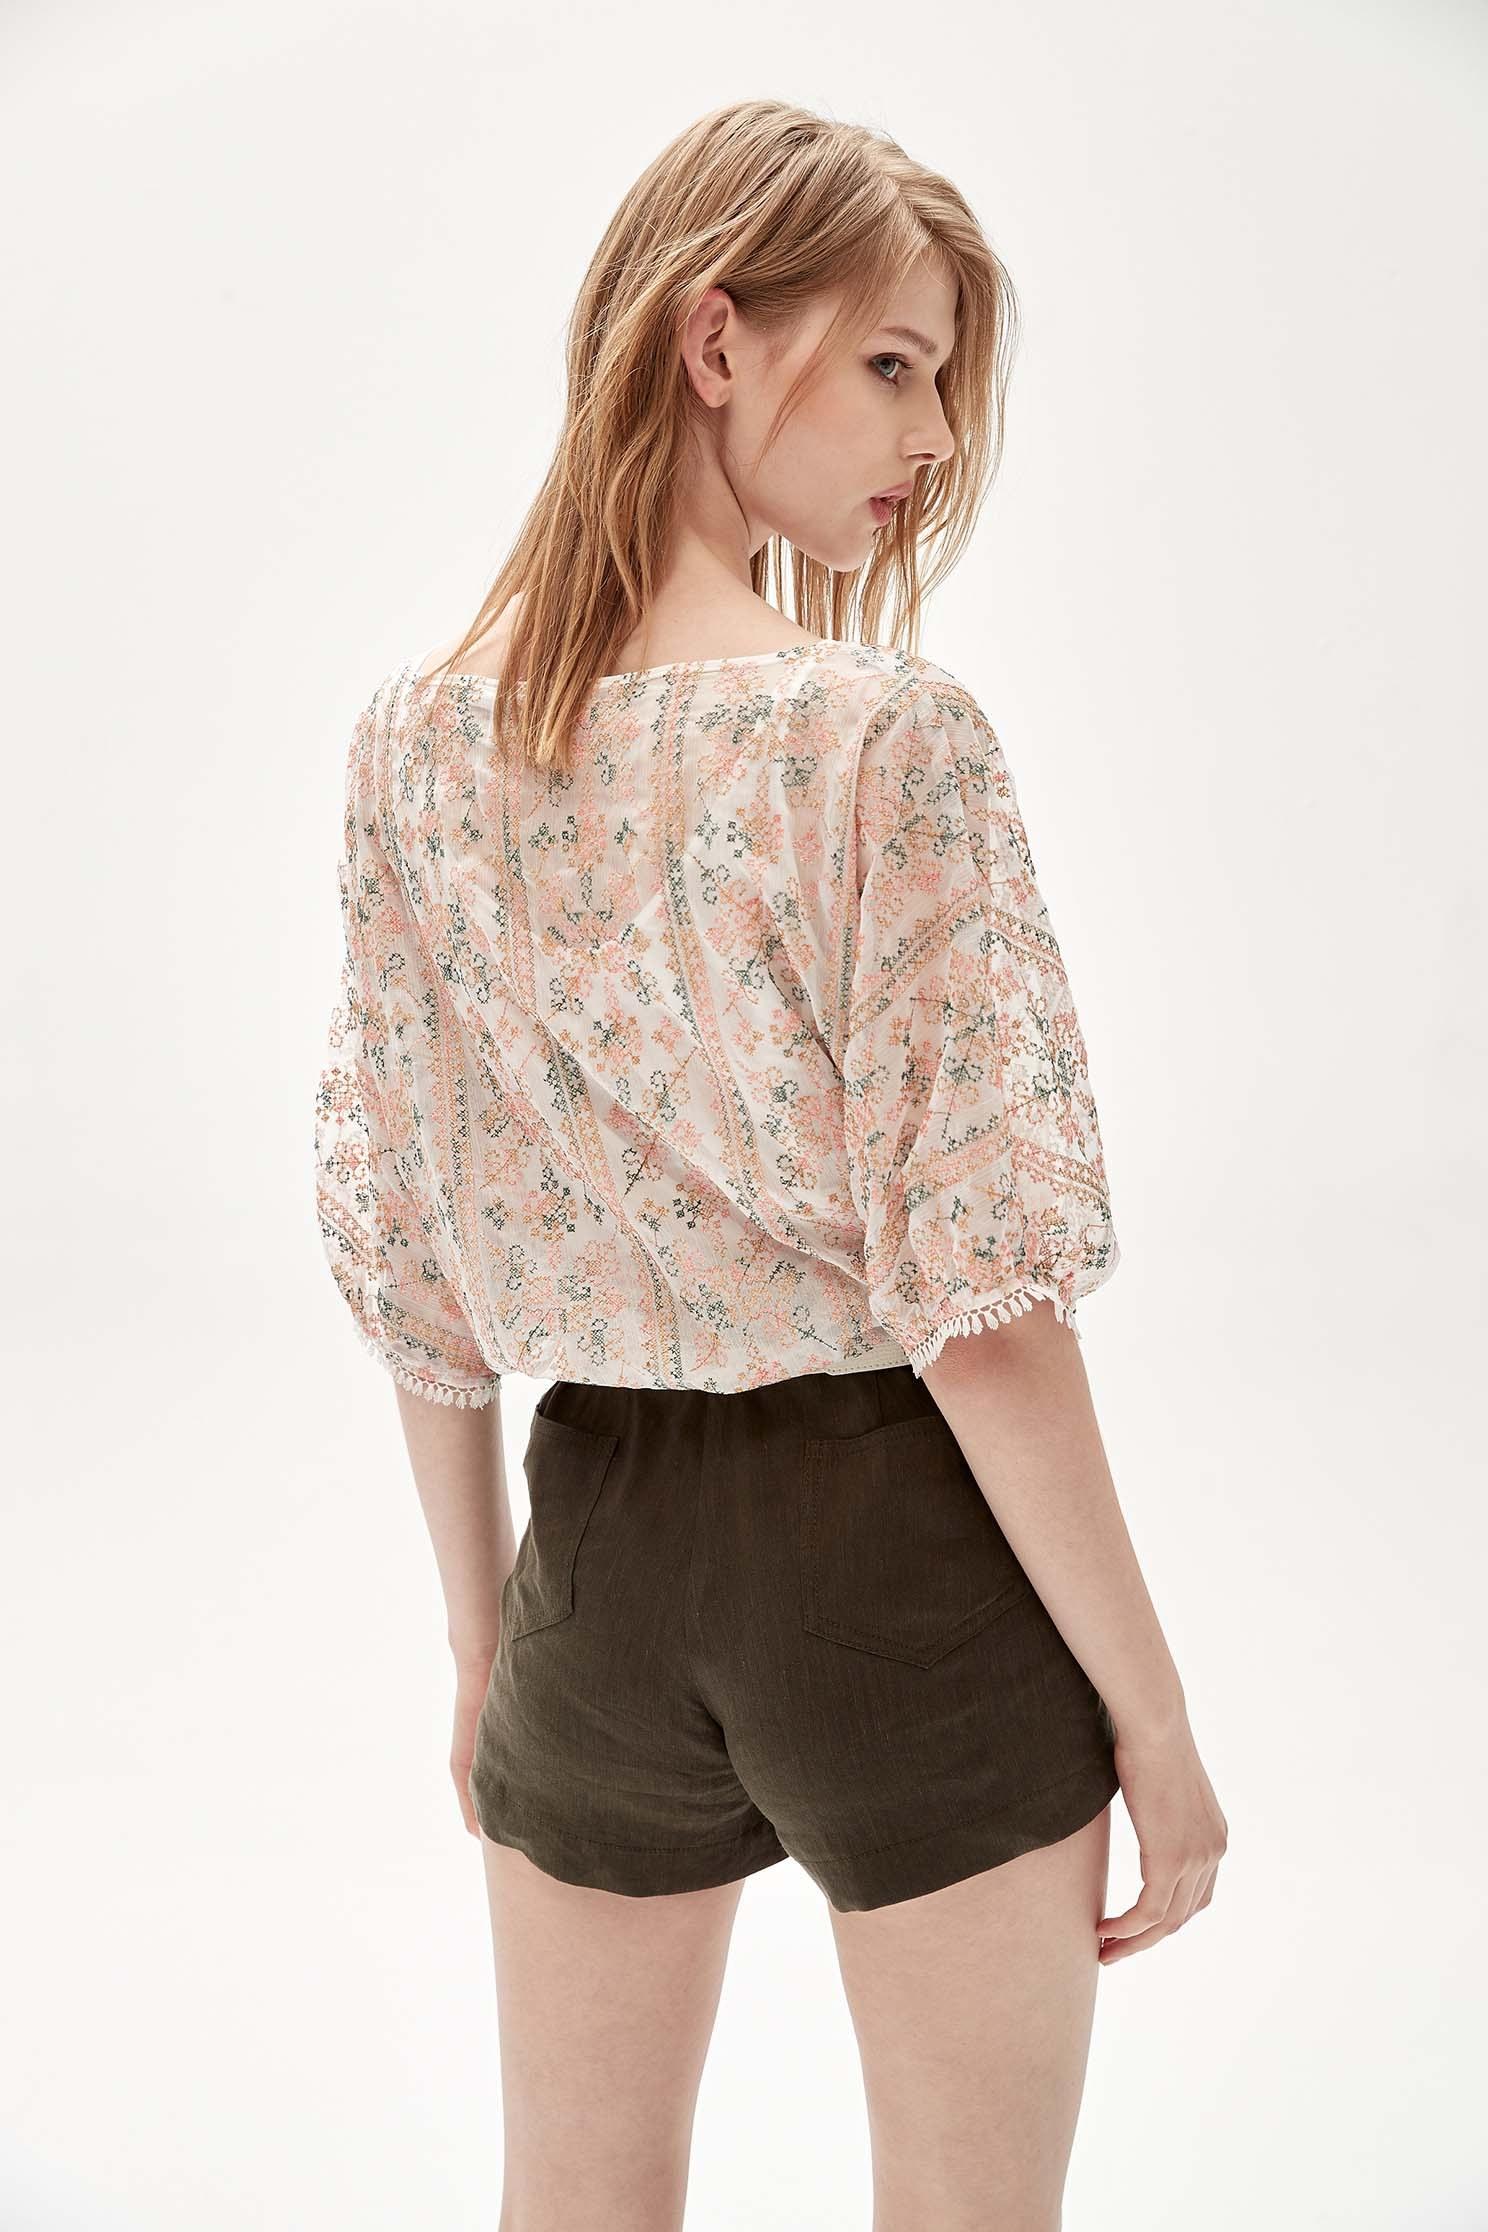 Darted waist cotton and linen shorts,Shorts,Season (AW) Look,Belts